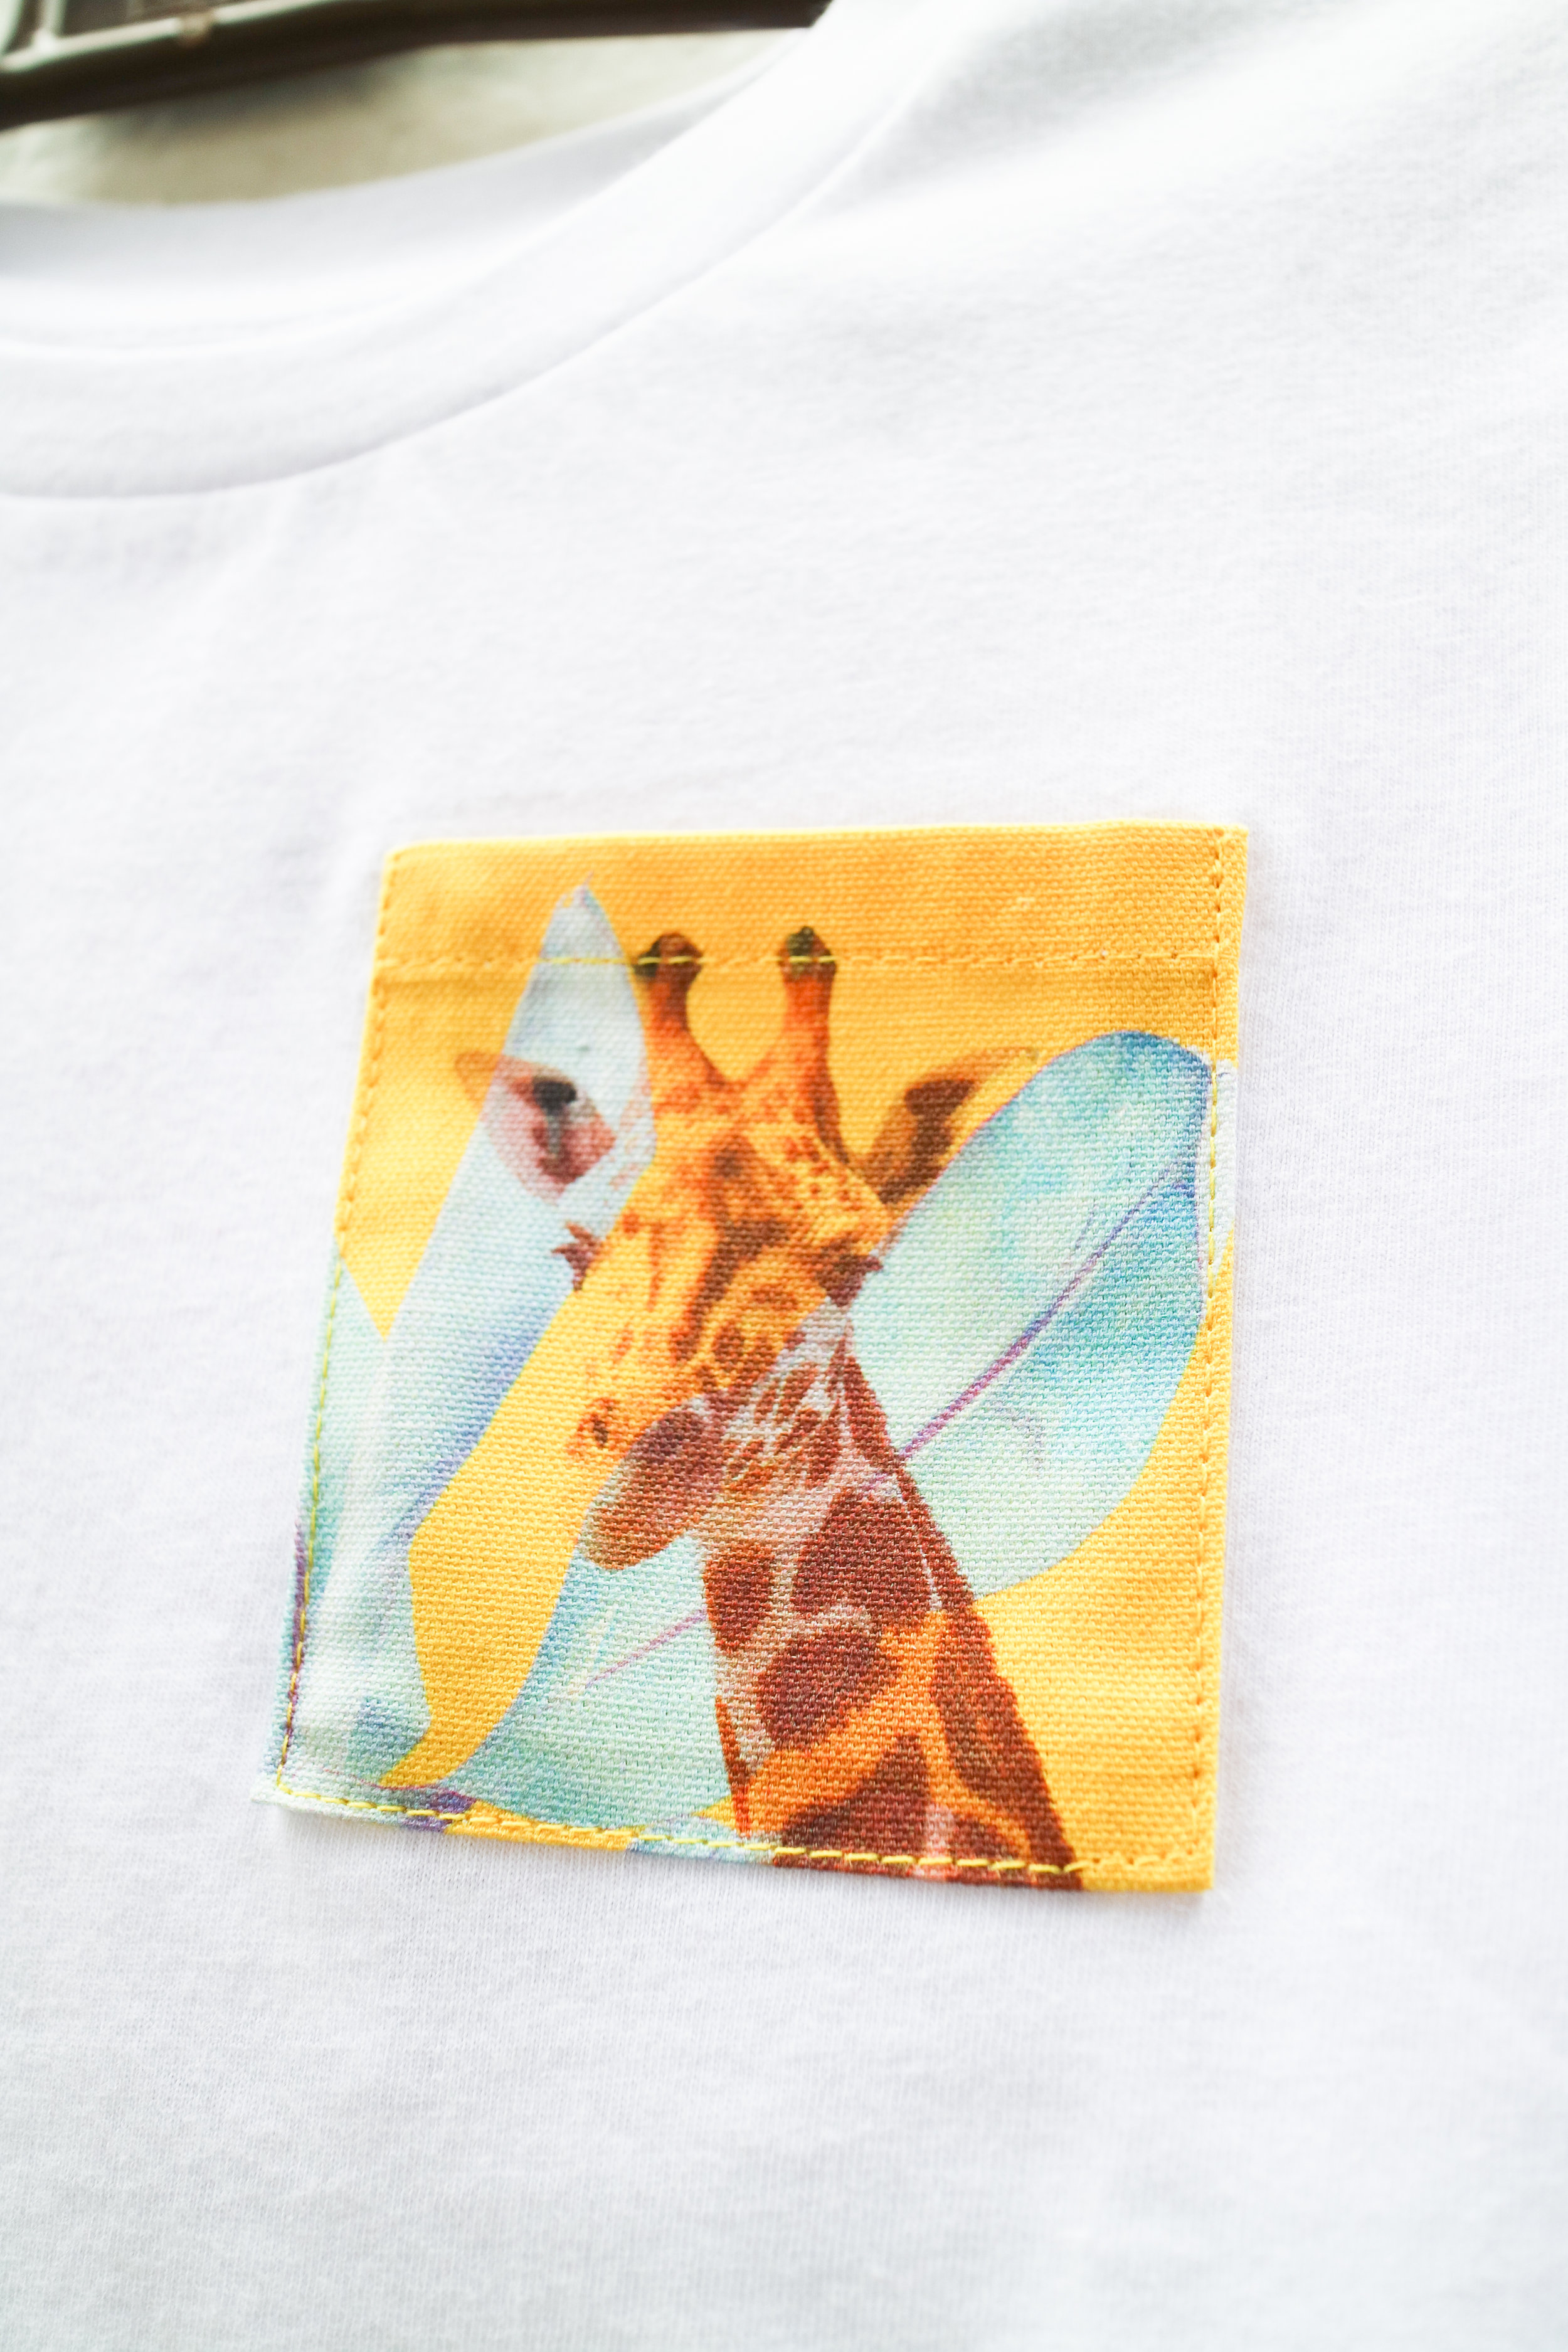 White T with Radiant Giraffe